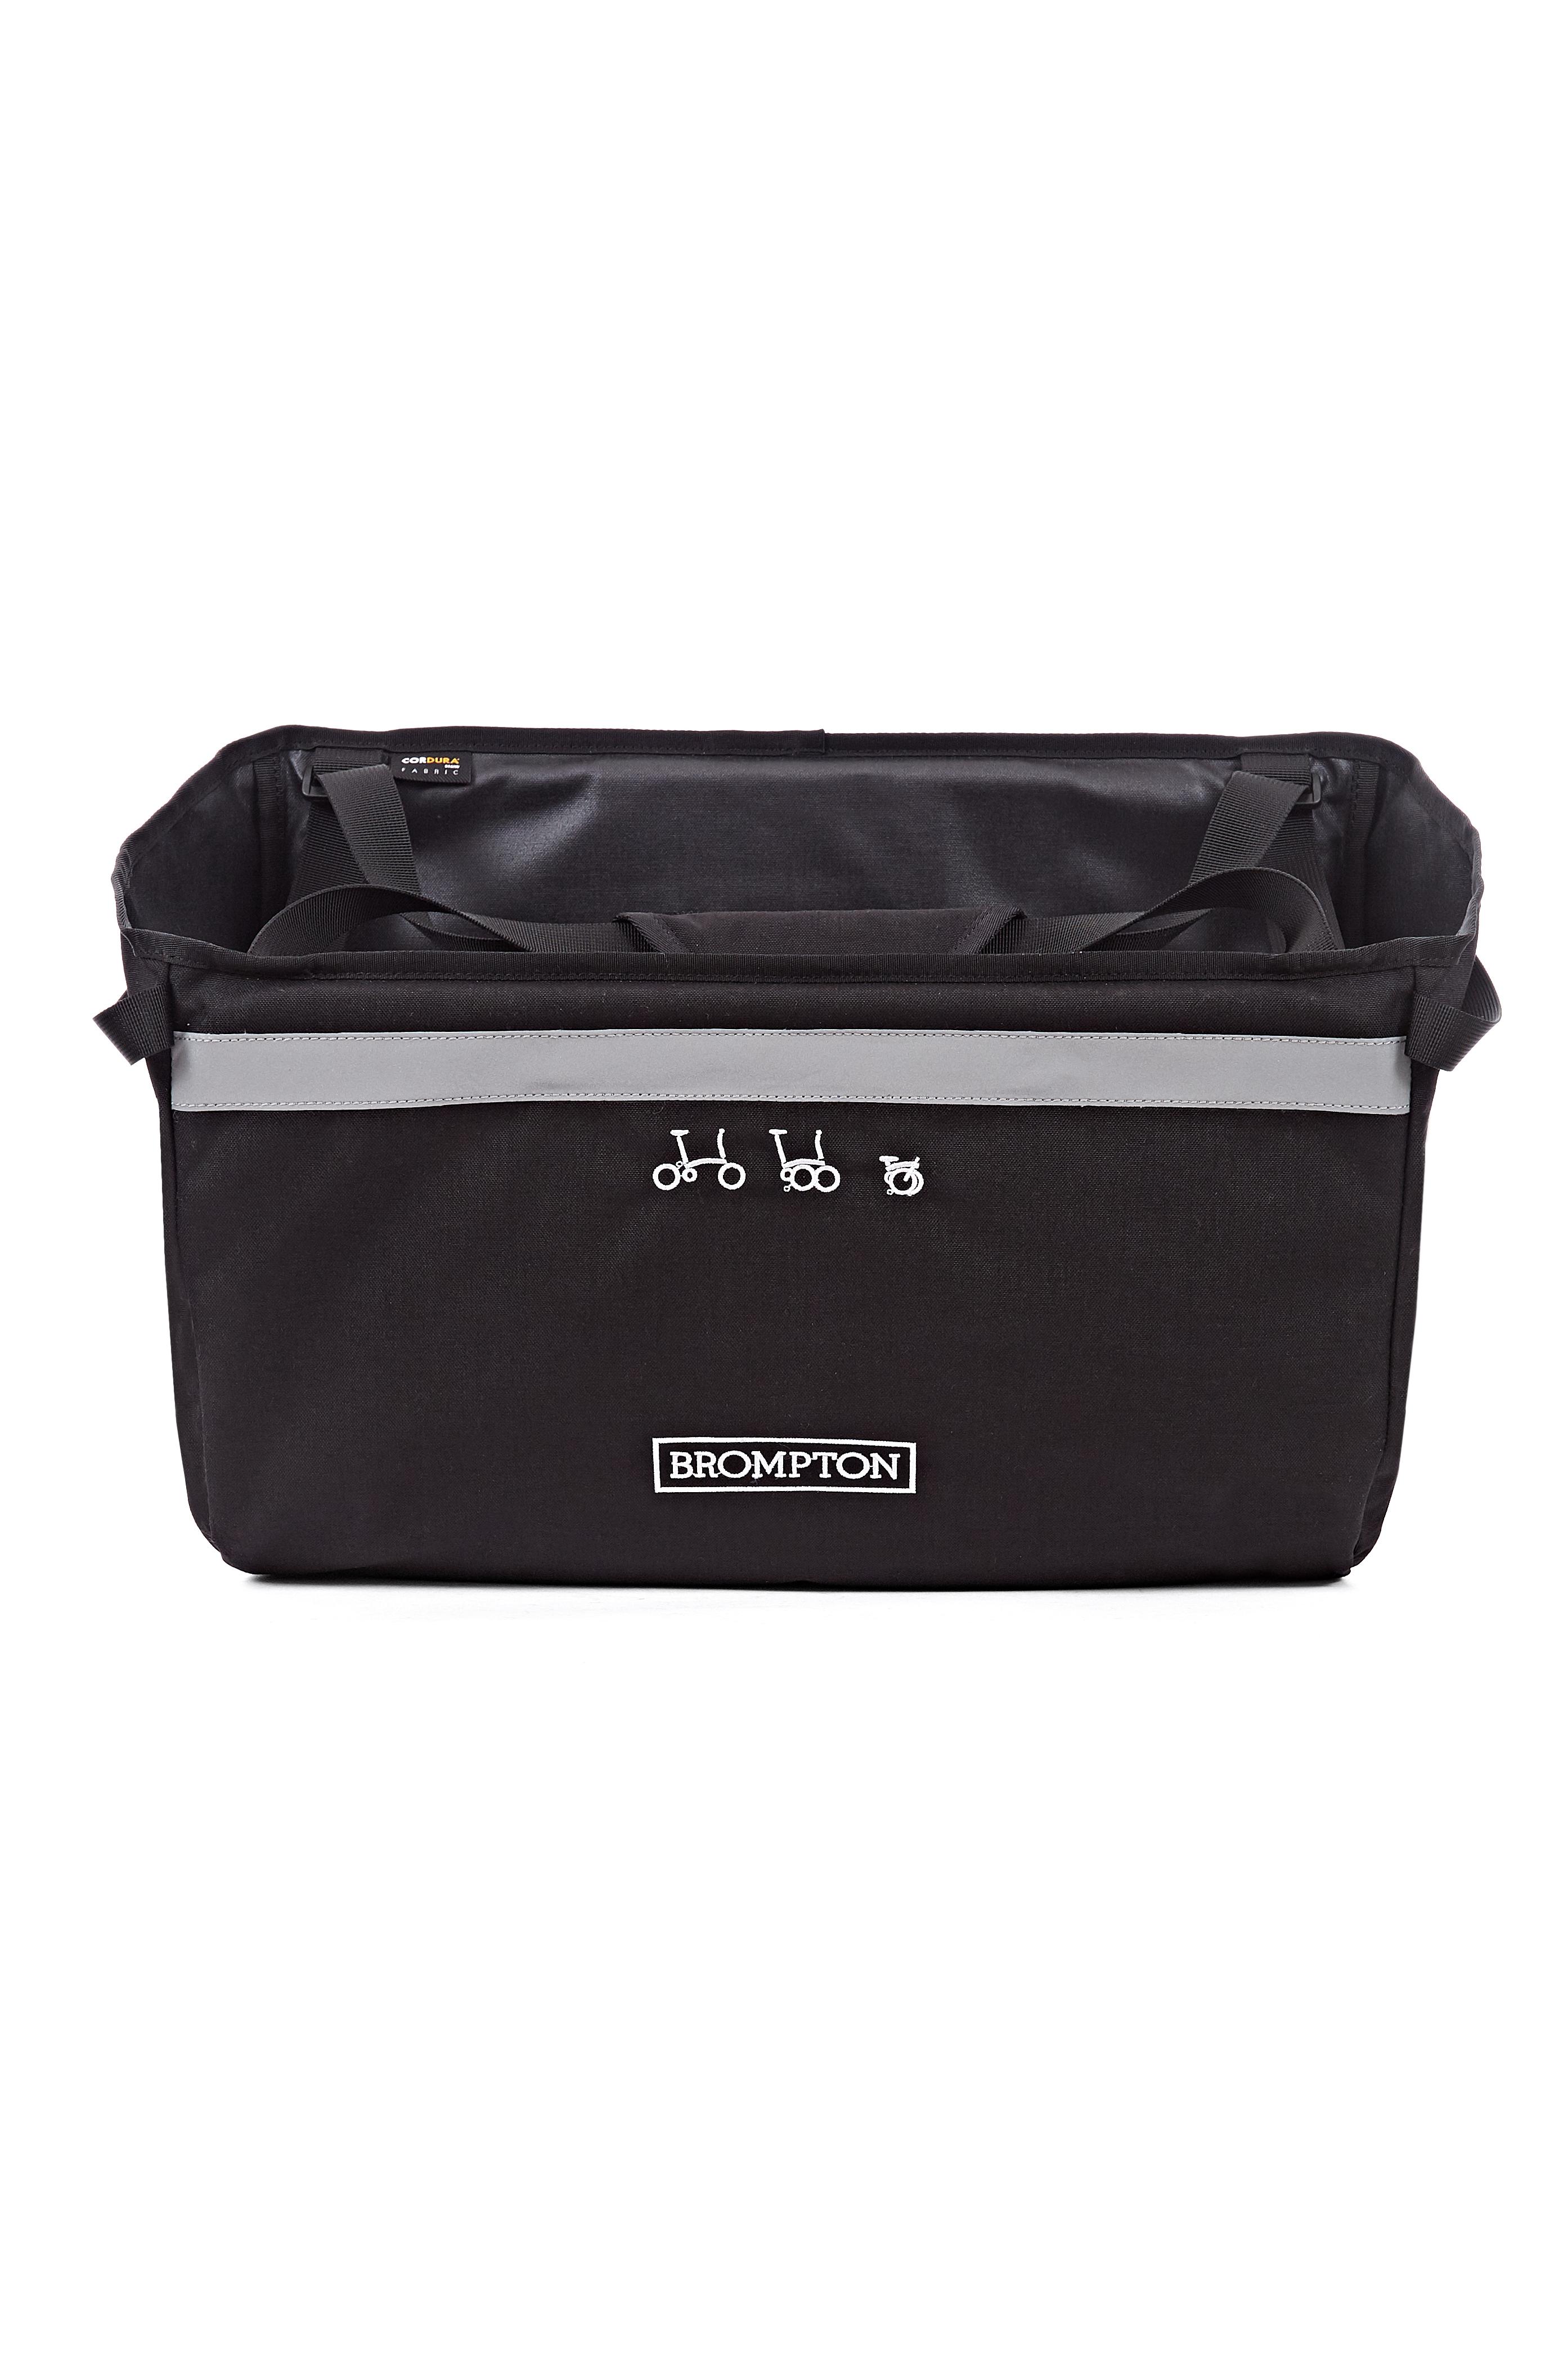 b8781aa2553 Brompton Basket Bag